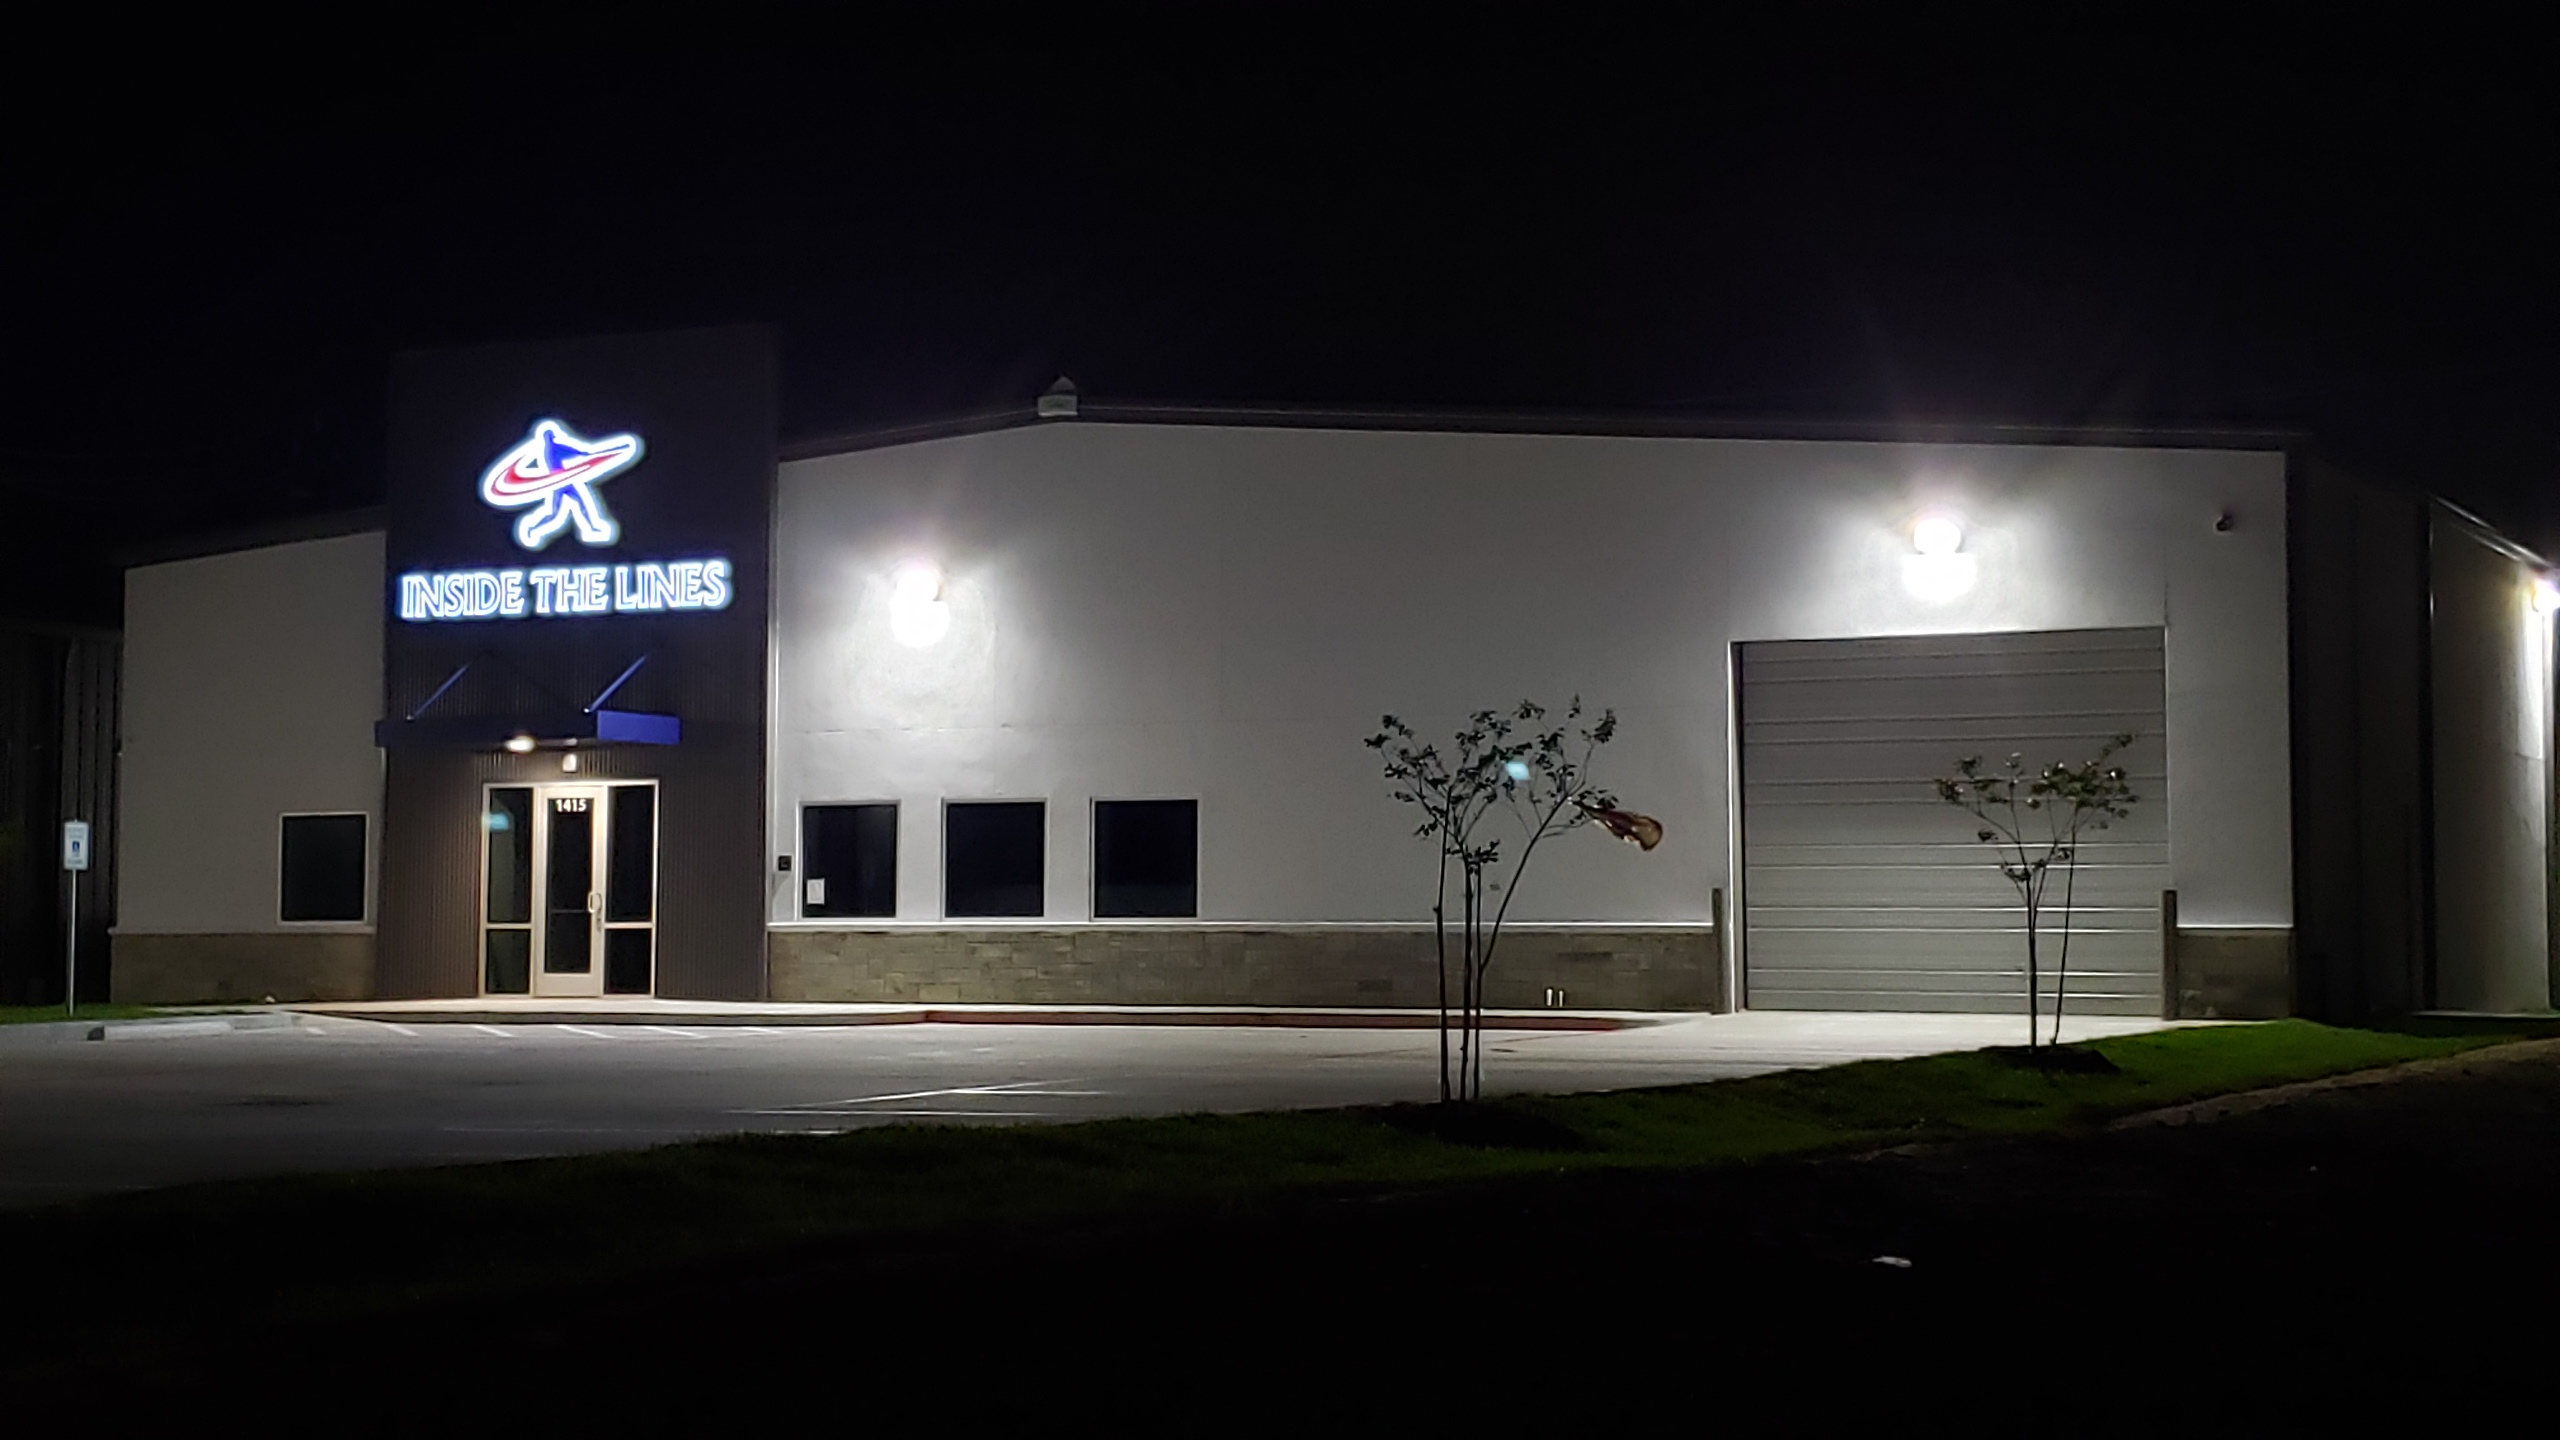 ITLS Exterior (Night)